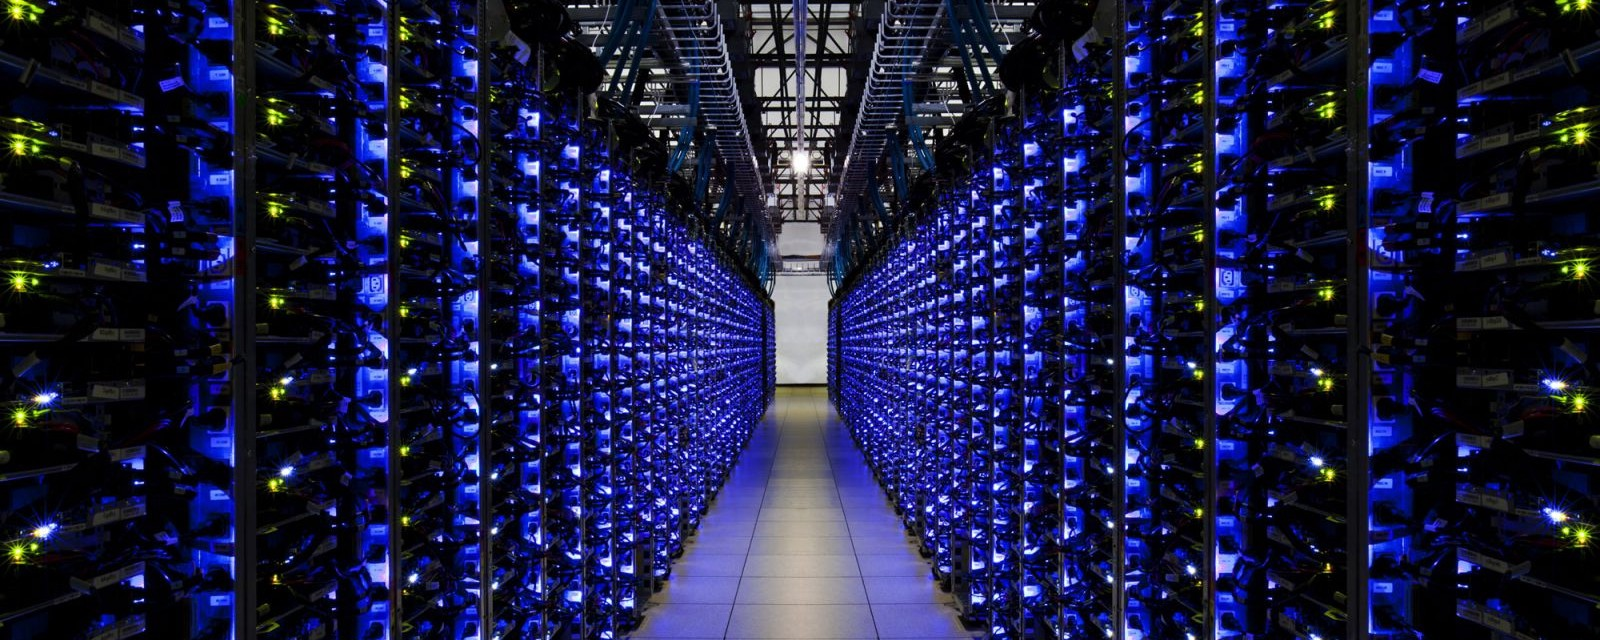 Online SQL Editor - An Innovative Software for Database Management